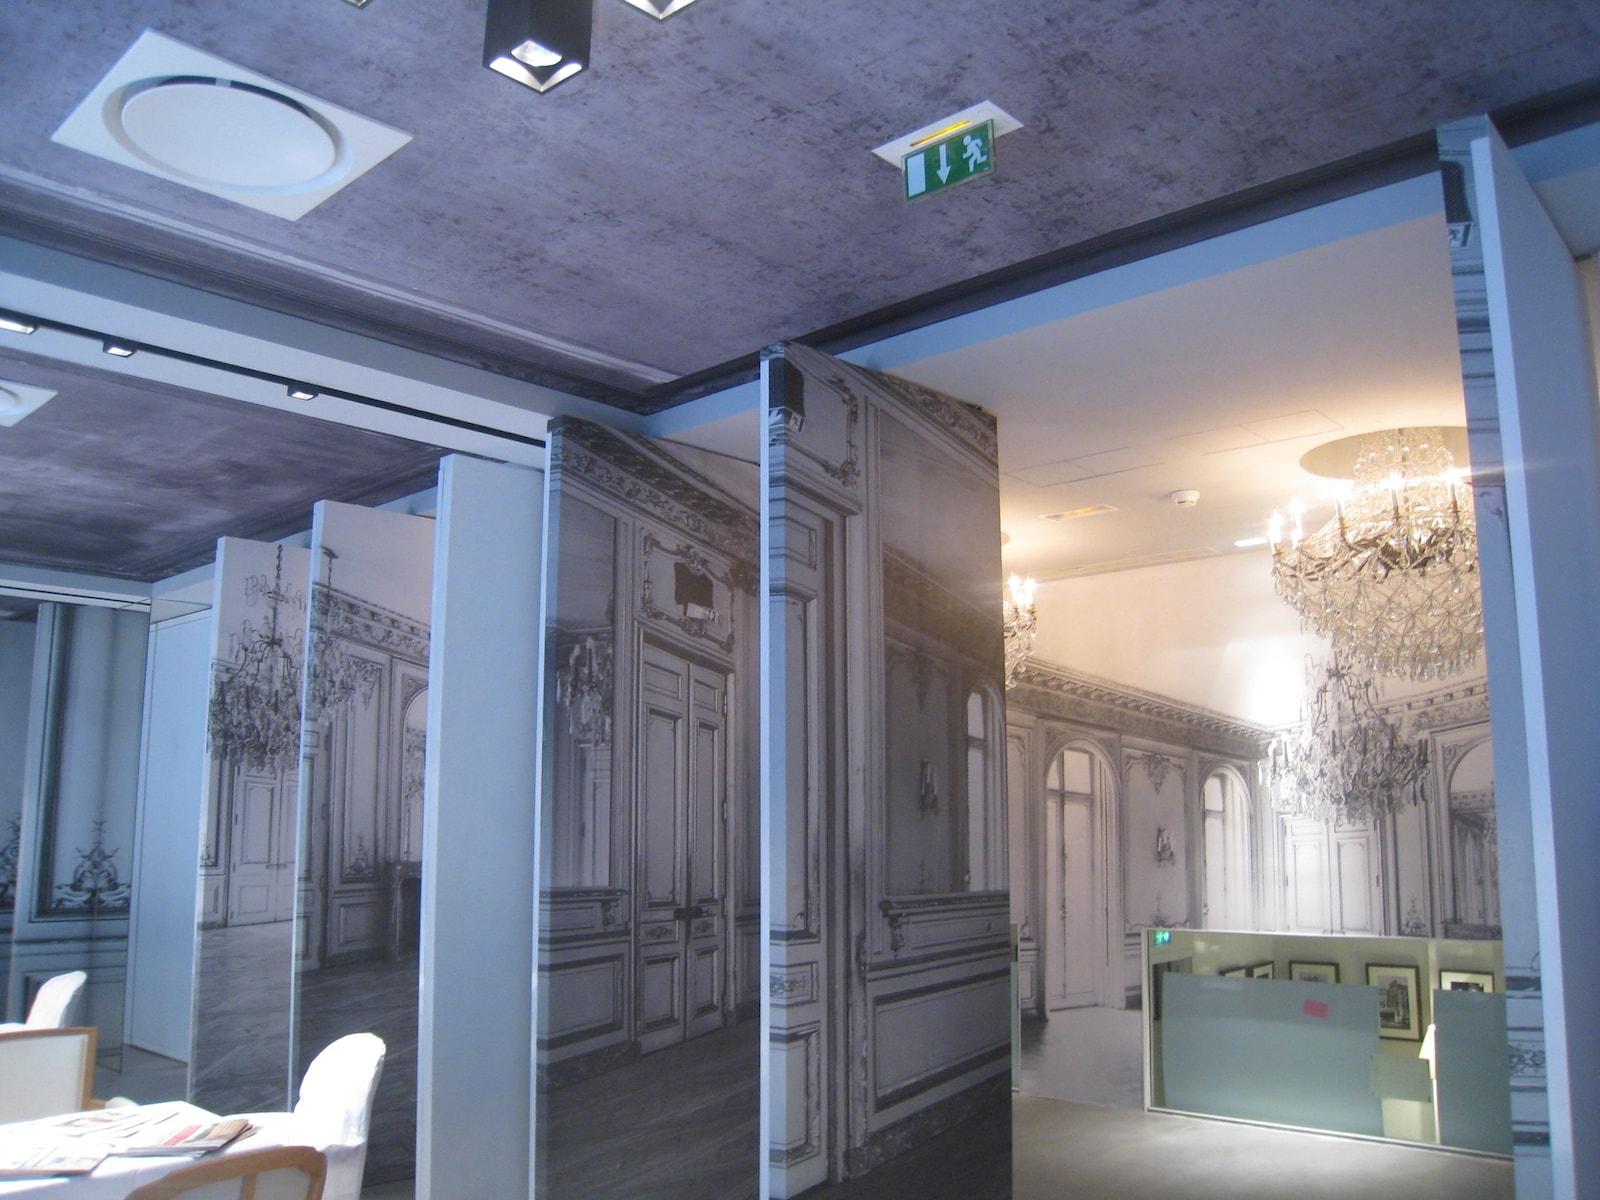 Plafond et mur tendu en textile Arketex